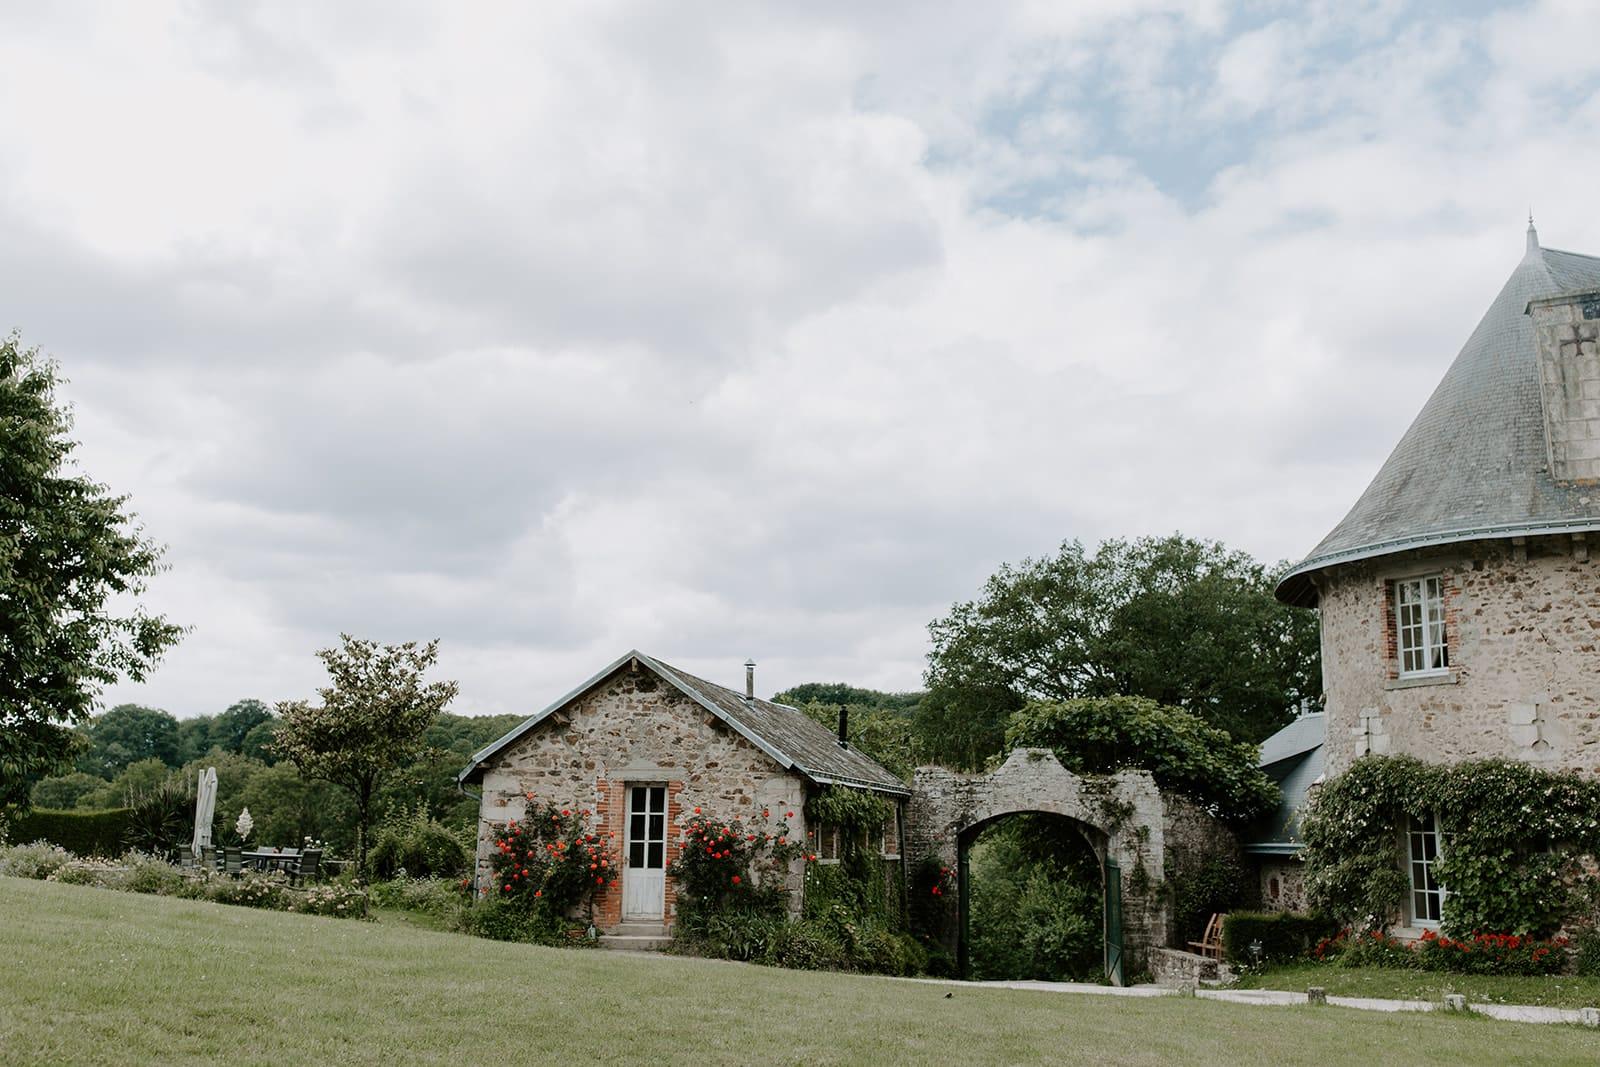 mariage_chateau_la_flocelliere_vendee_flavie_nelly_photographe-167-obonheurdesdames-decoration-mariage-location-vegetal